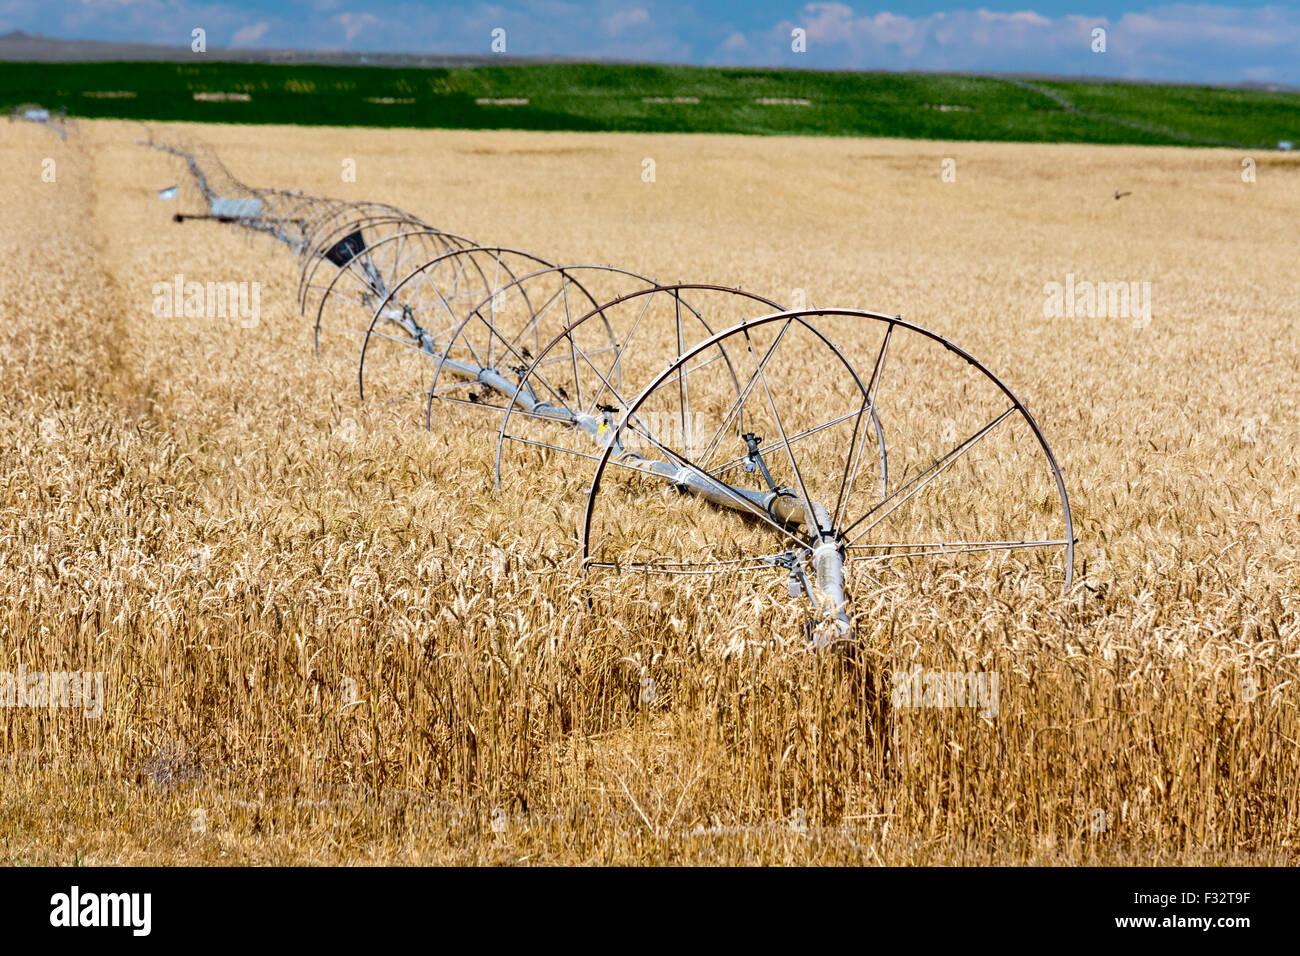 Moreland, Idaho - Irrigation equipment in an Idaho wheat field. - Stock Image